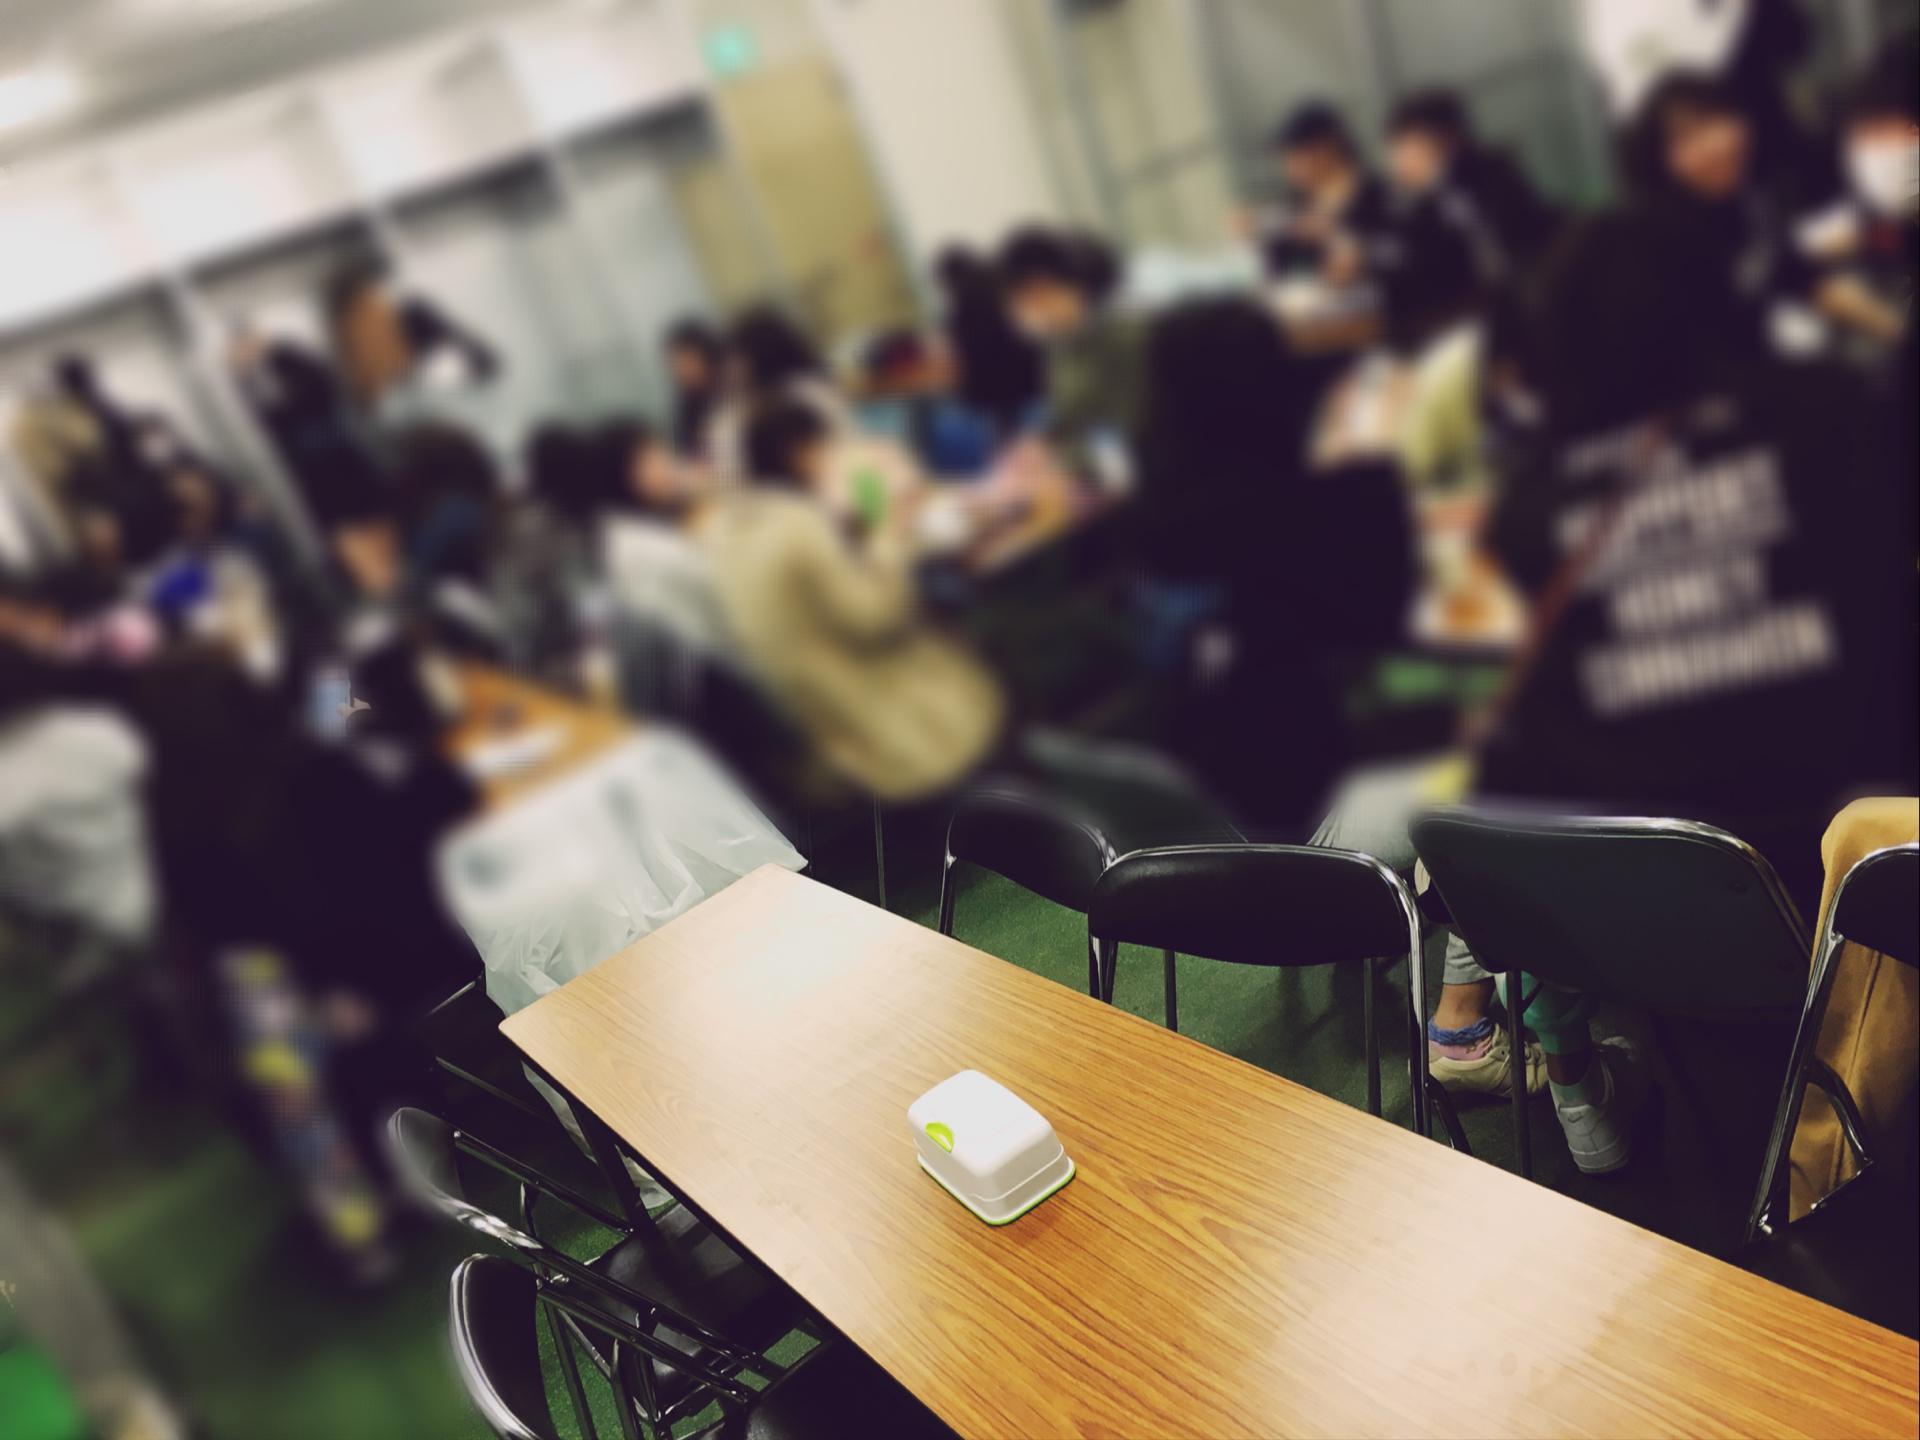 http://stat.7gogo.jp/appimg_images/20160325/14/cb/QI/j/o19201440p.jpg